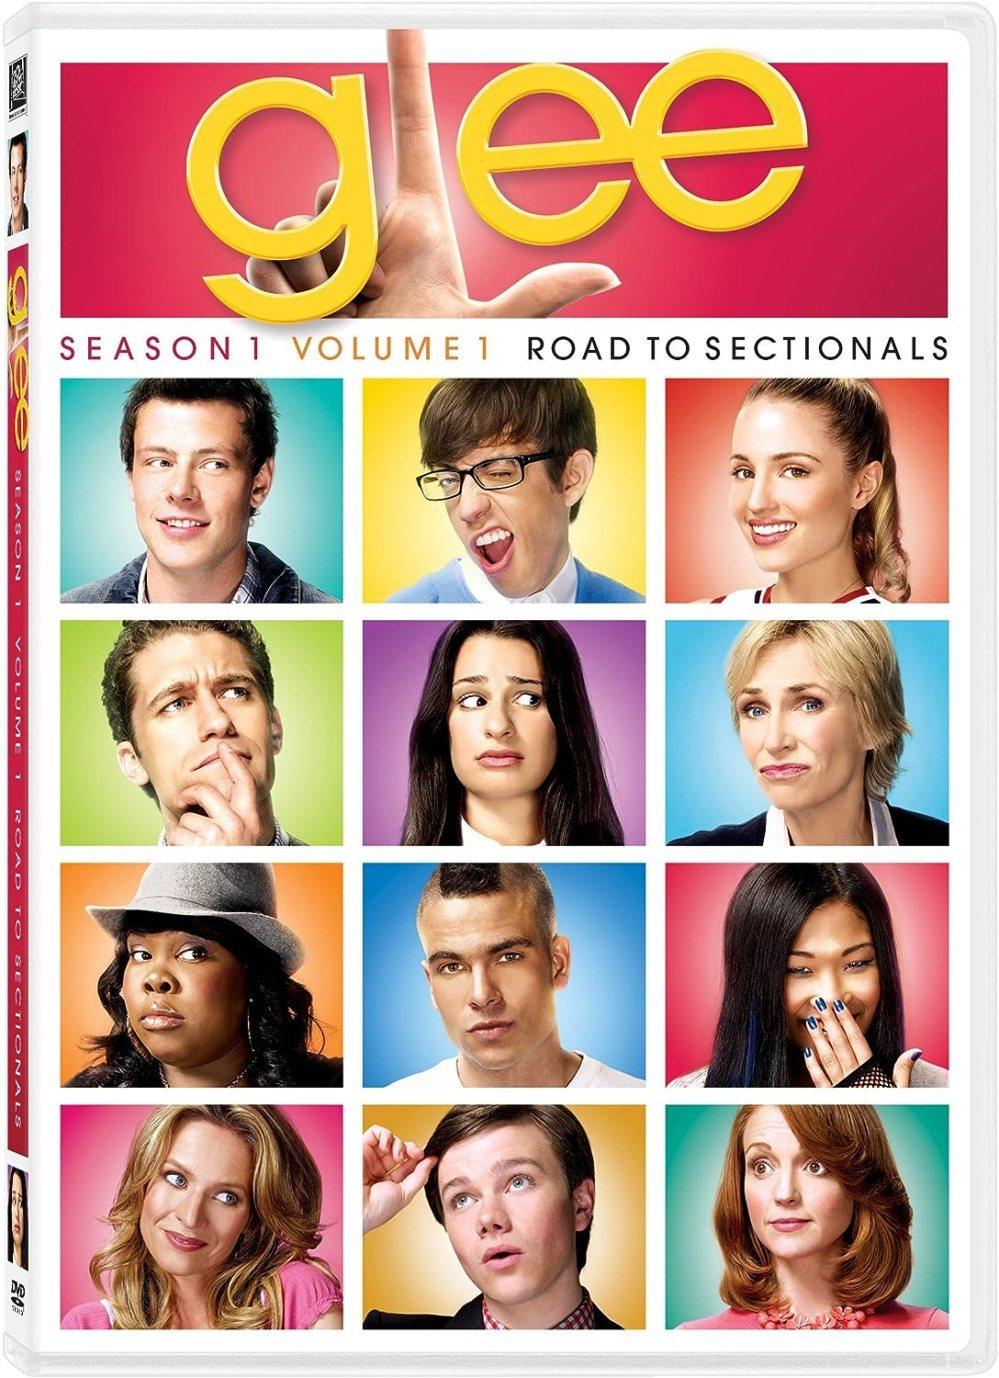 Amazon.com: Glee: Season 1, Vol. 1 - Road to Sectionals: Cory Monteith, Lea  Michele, Matthew Morrison, Jane Lynch, Dianna Agron, Jessalyn Gilsig, Chris  Colfer, Jayma Mays, Kevin McHale, Amber Riley, Mark Salling,